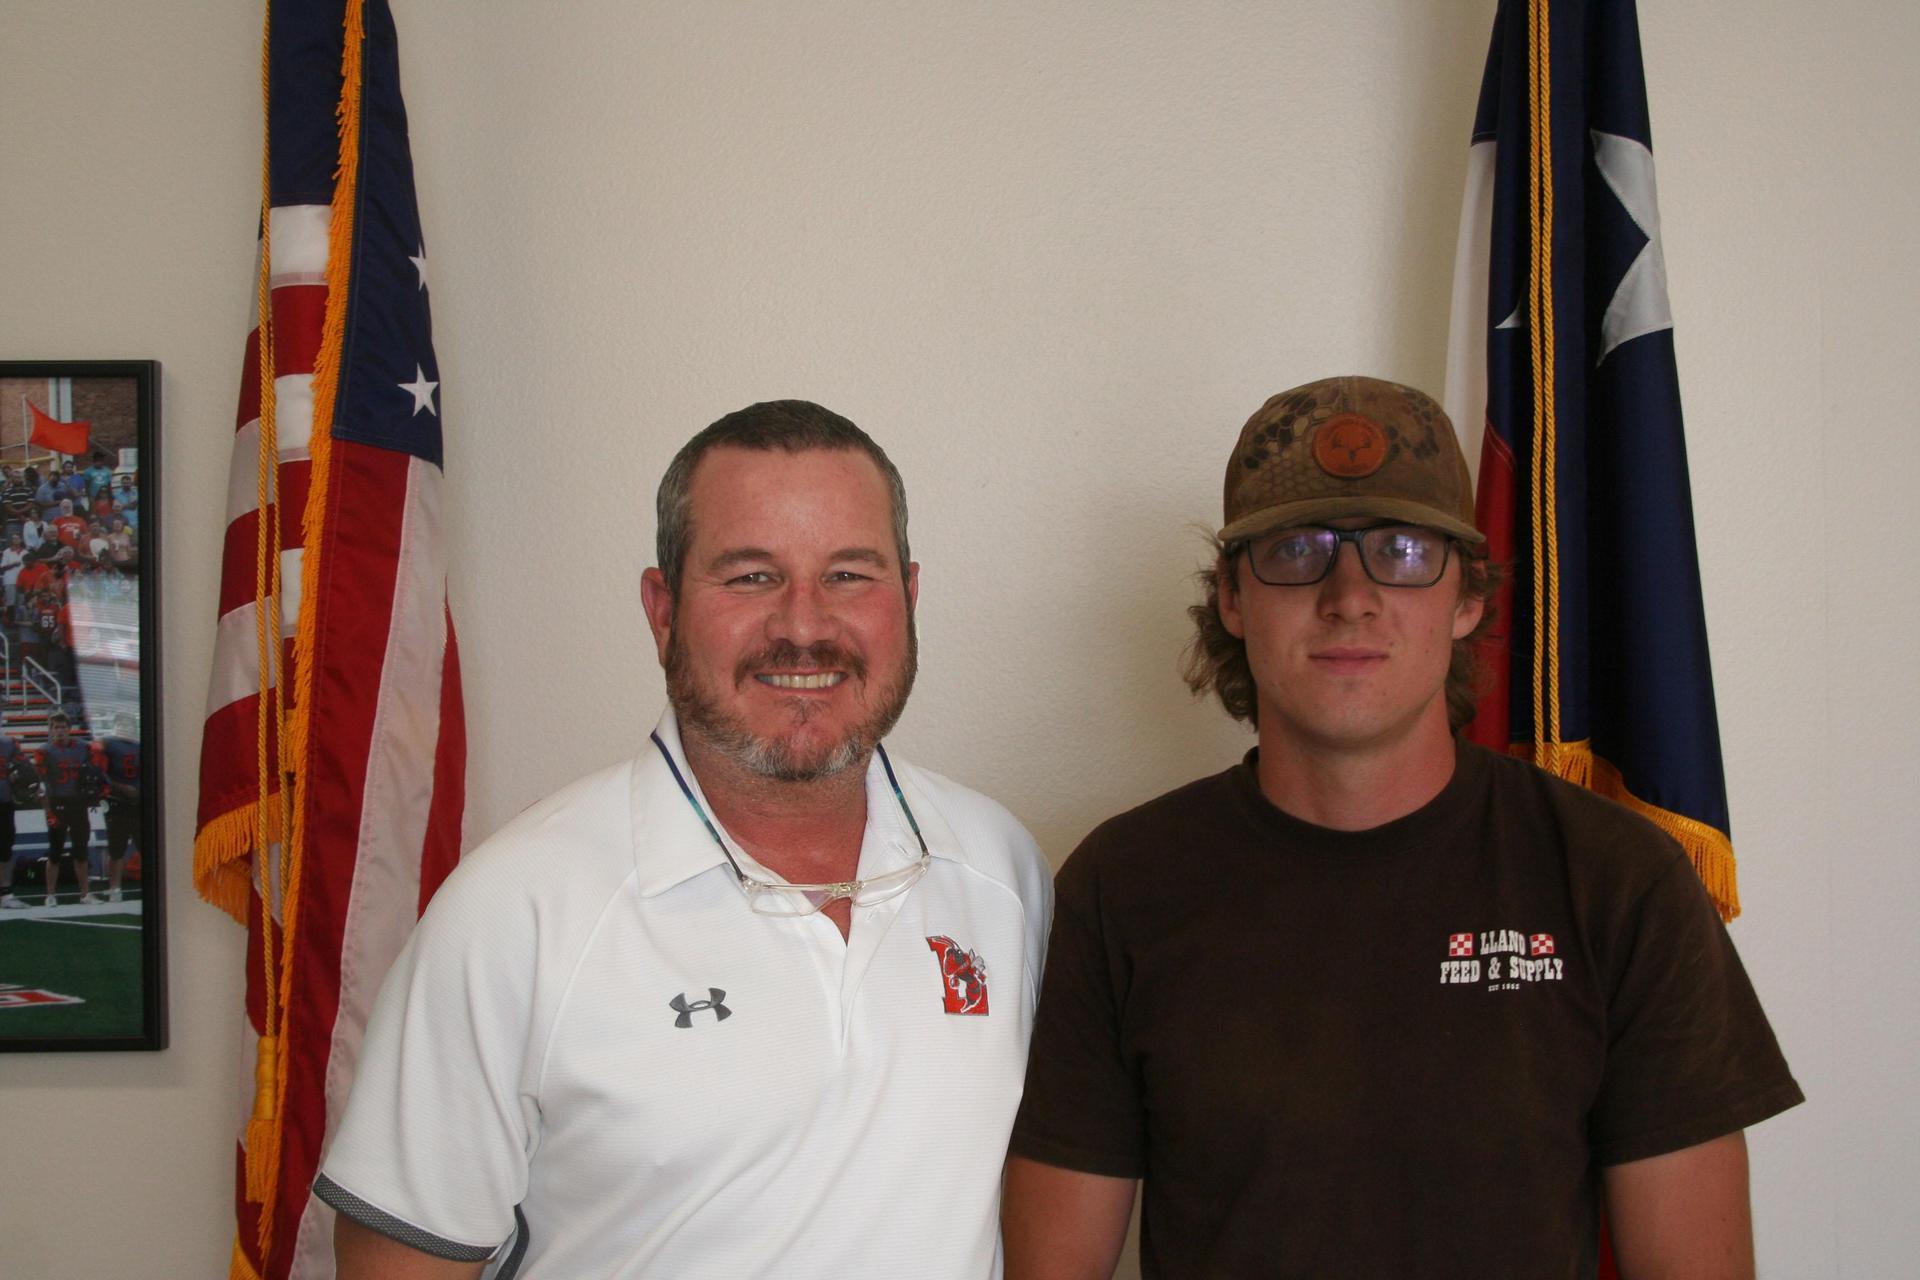 Mr. Payne and Tyler Westermann